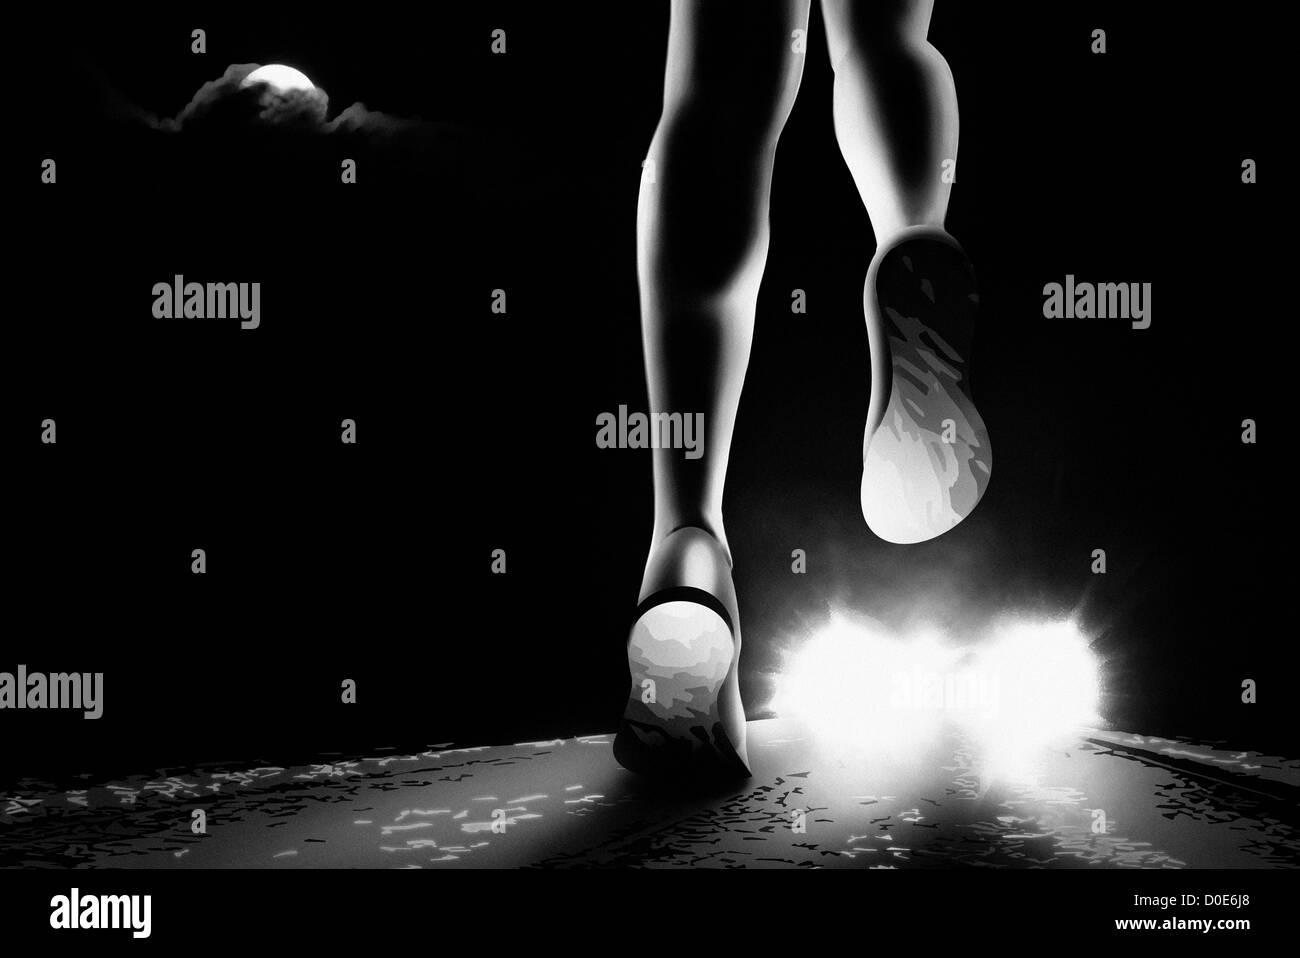 Hembra trotar en la noche. Imagen De Stock